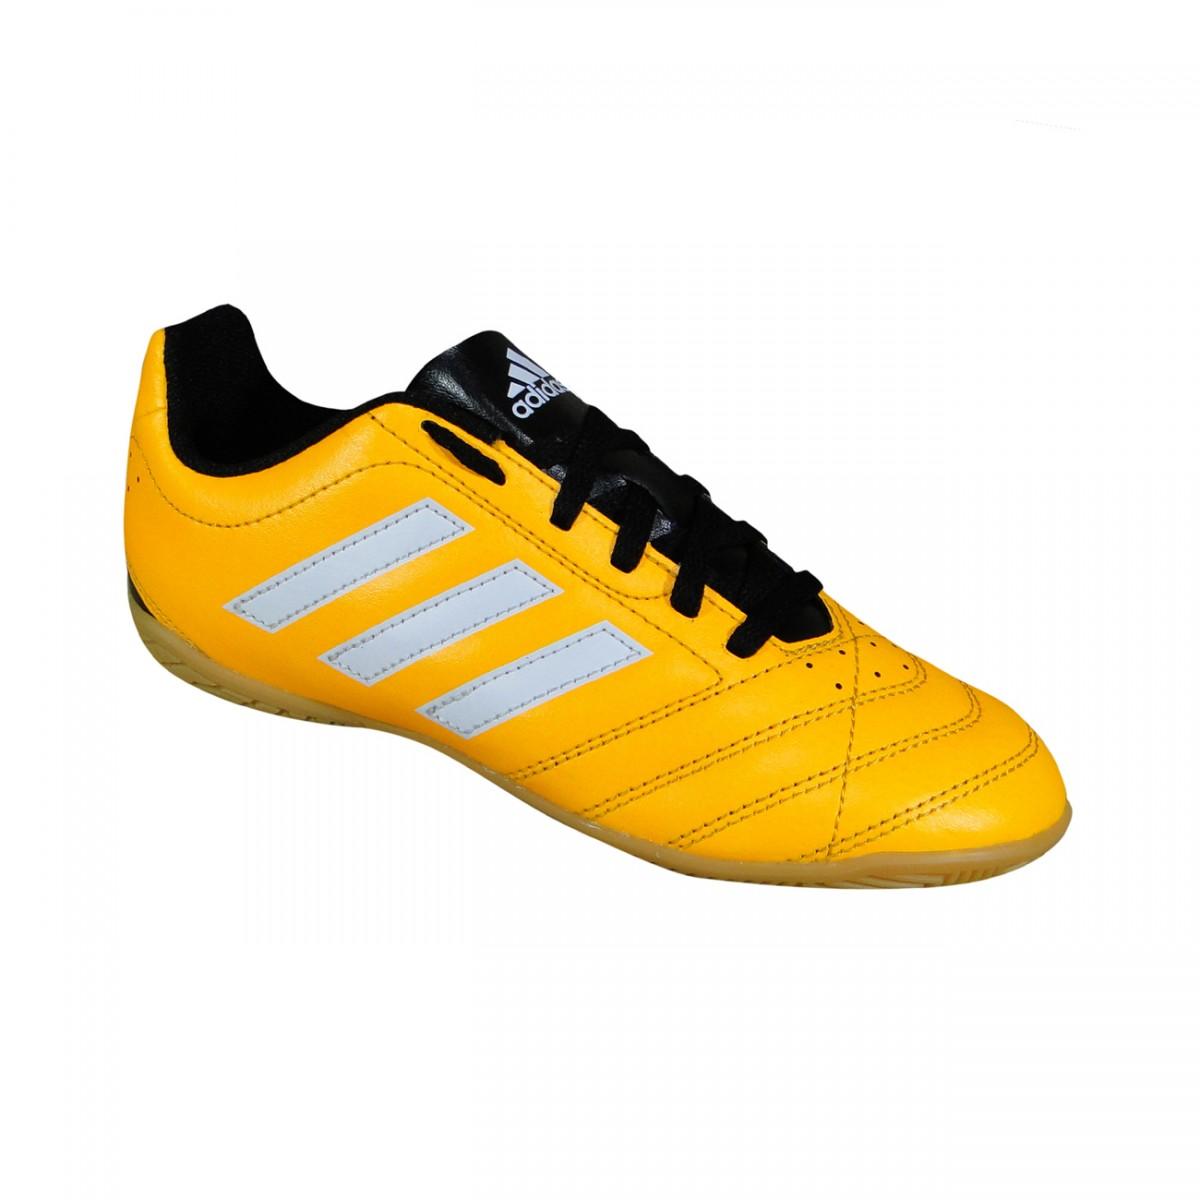 8d2ad4bc31 Tenis Adidas Goletto V Infantil AF5001 - Laranja Branco - Chuteira Nike